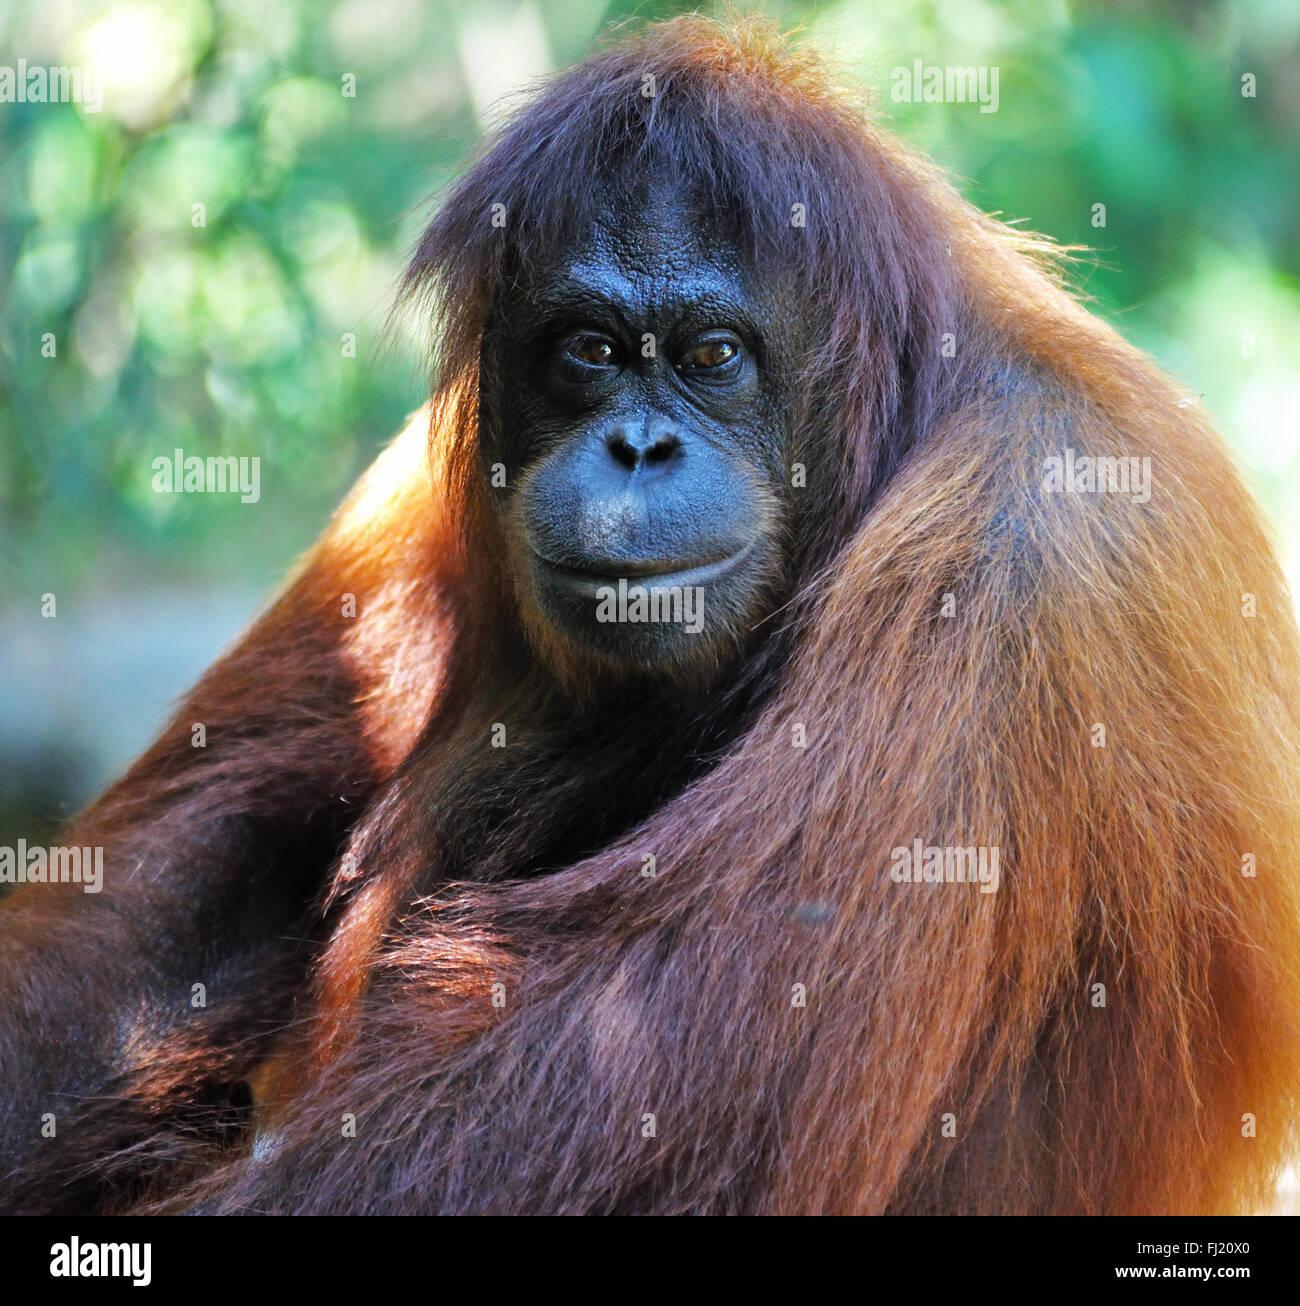 Orangutan in Sabah Borneo, Malaysia. - Stock Image